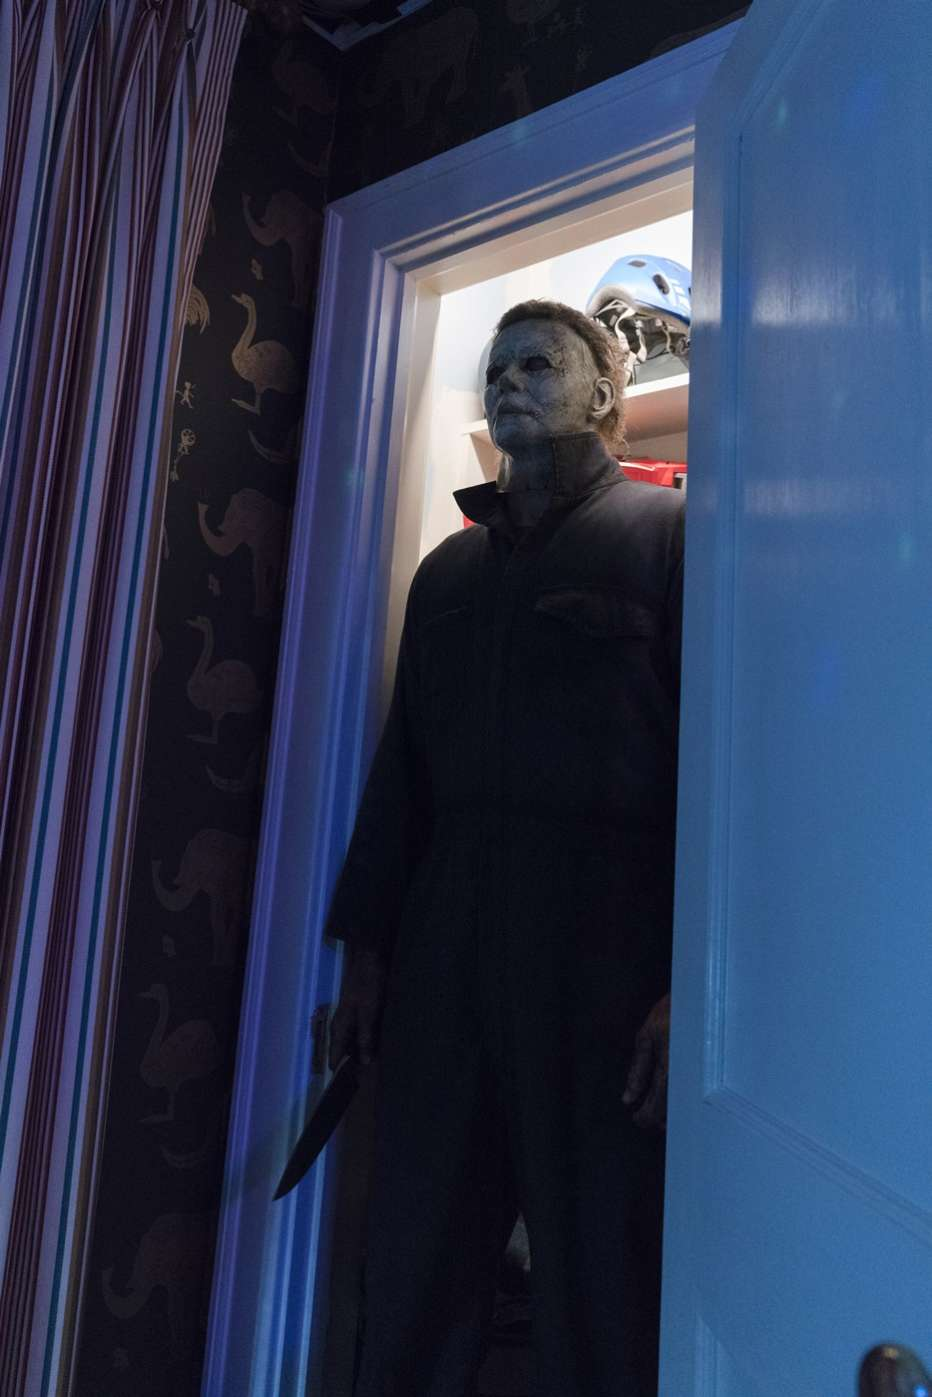 Halloween-2018-David-Gordon-Green-008.jpg